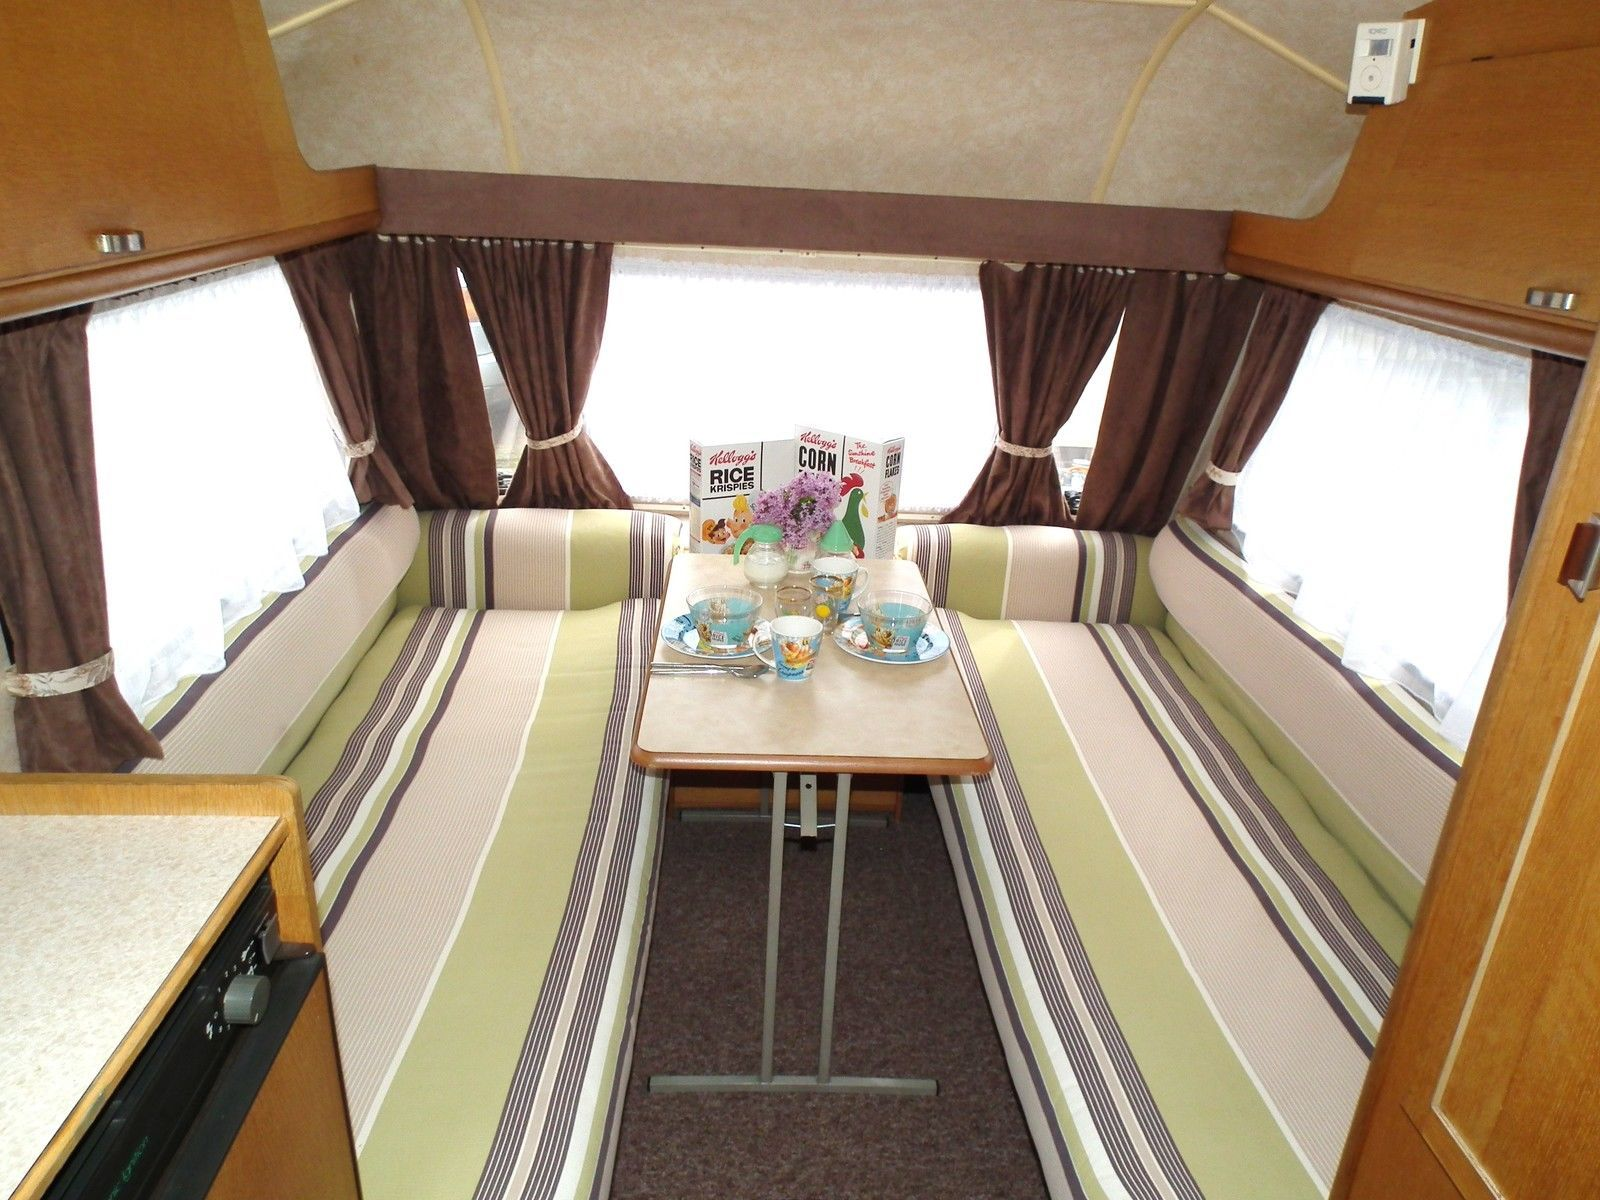 Retro Vintage Shabby Chic Caravan Avondale Wren 1986 2 Berth Shabby Chic Caravan Caravan Interior Shabby Chic